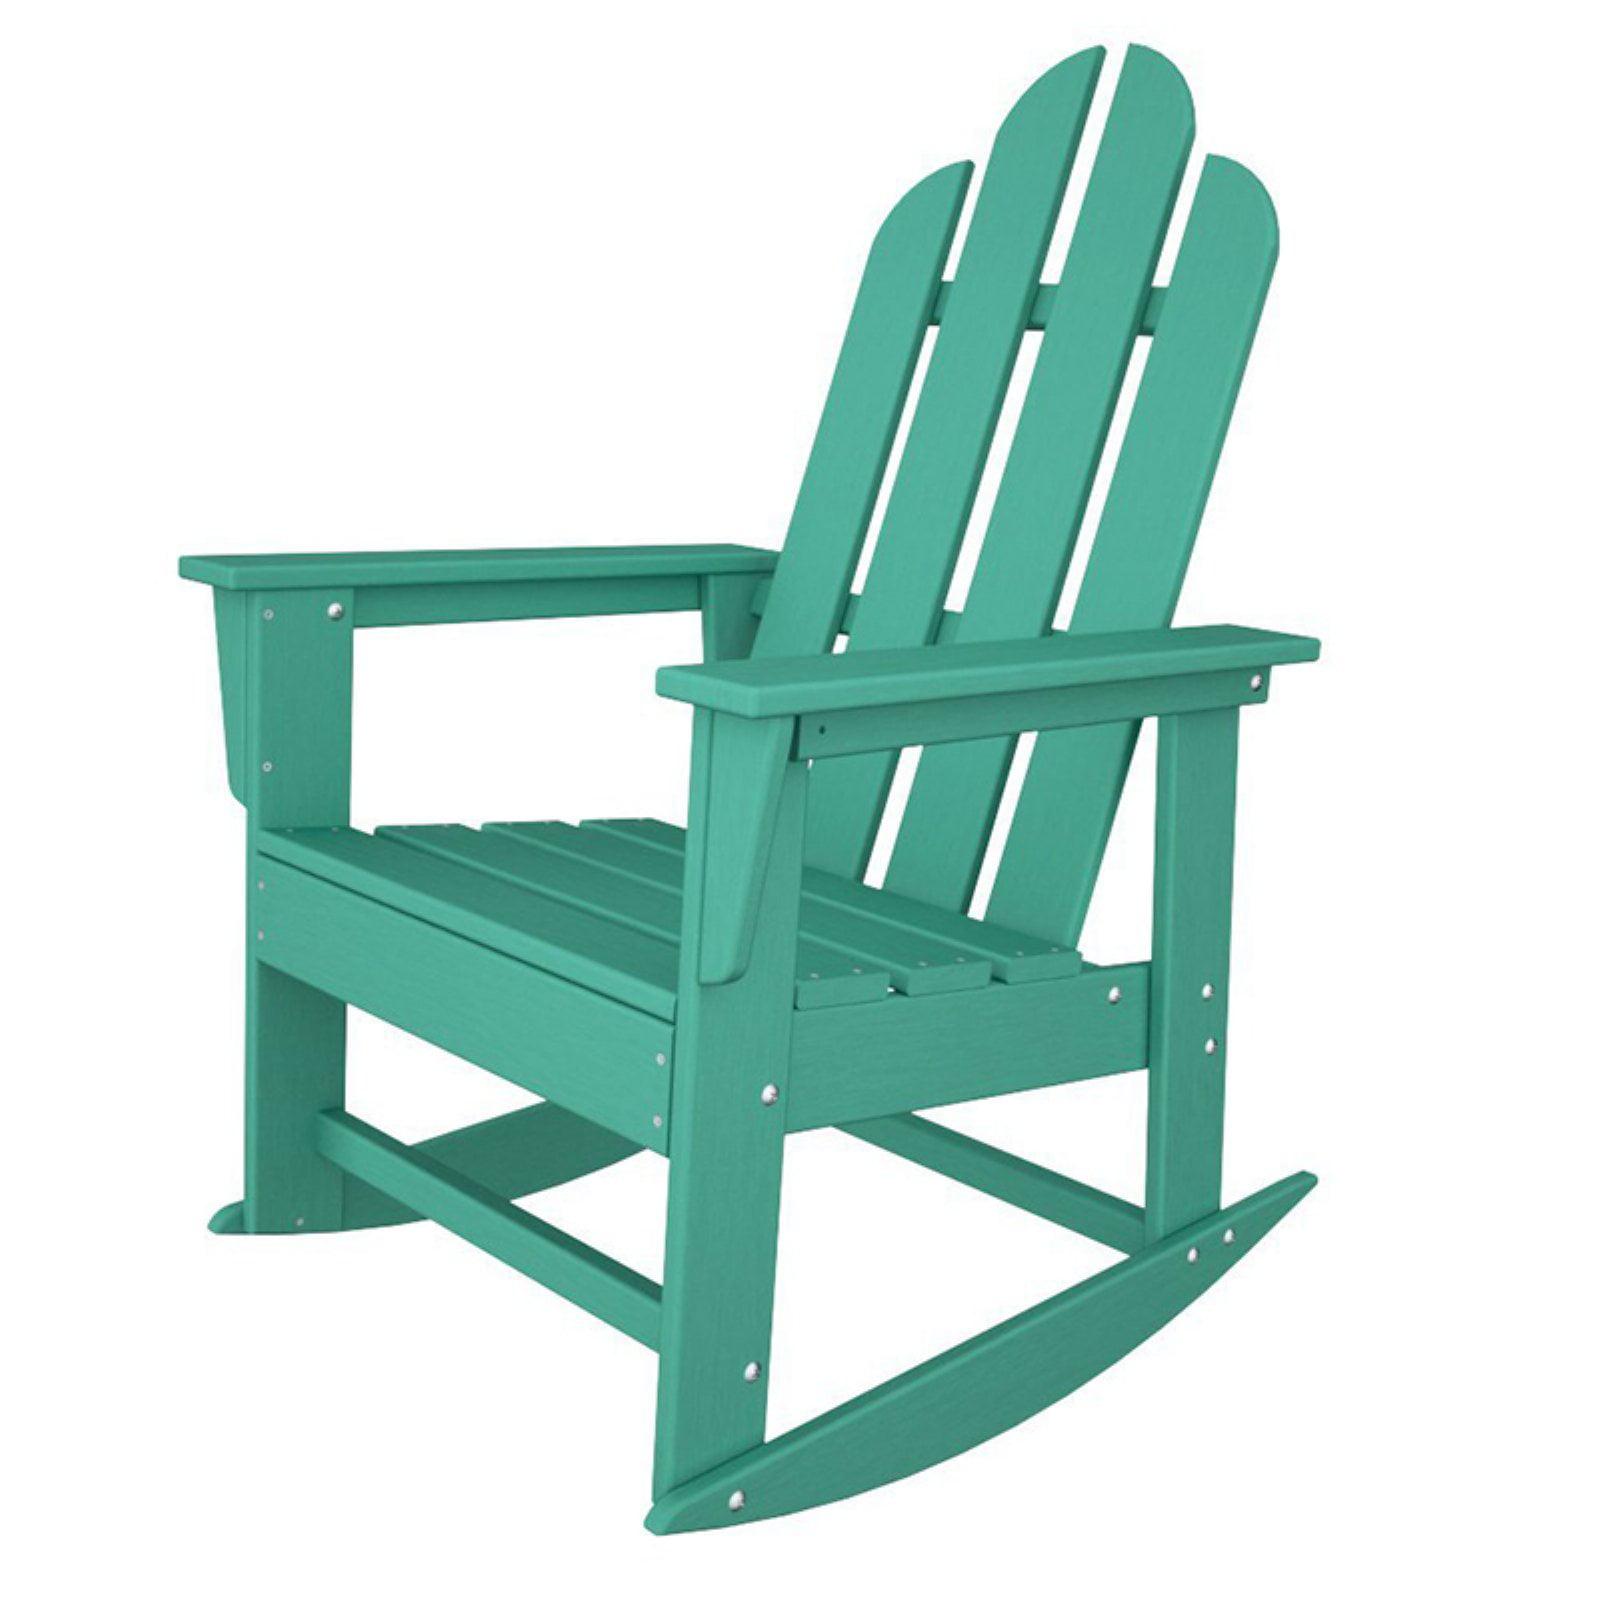 POLYWOOD® Long Island Recycled Plastic Adirondack Rocking Chair